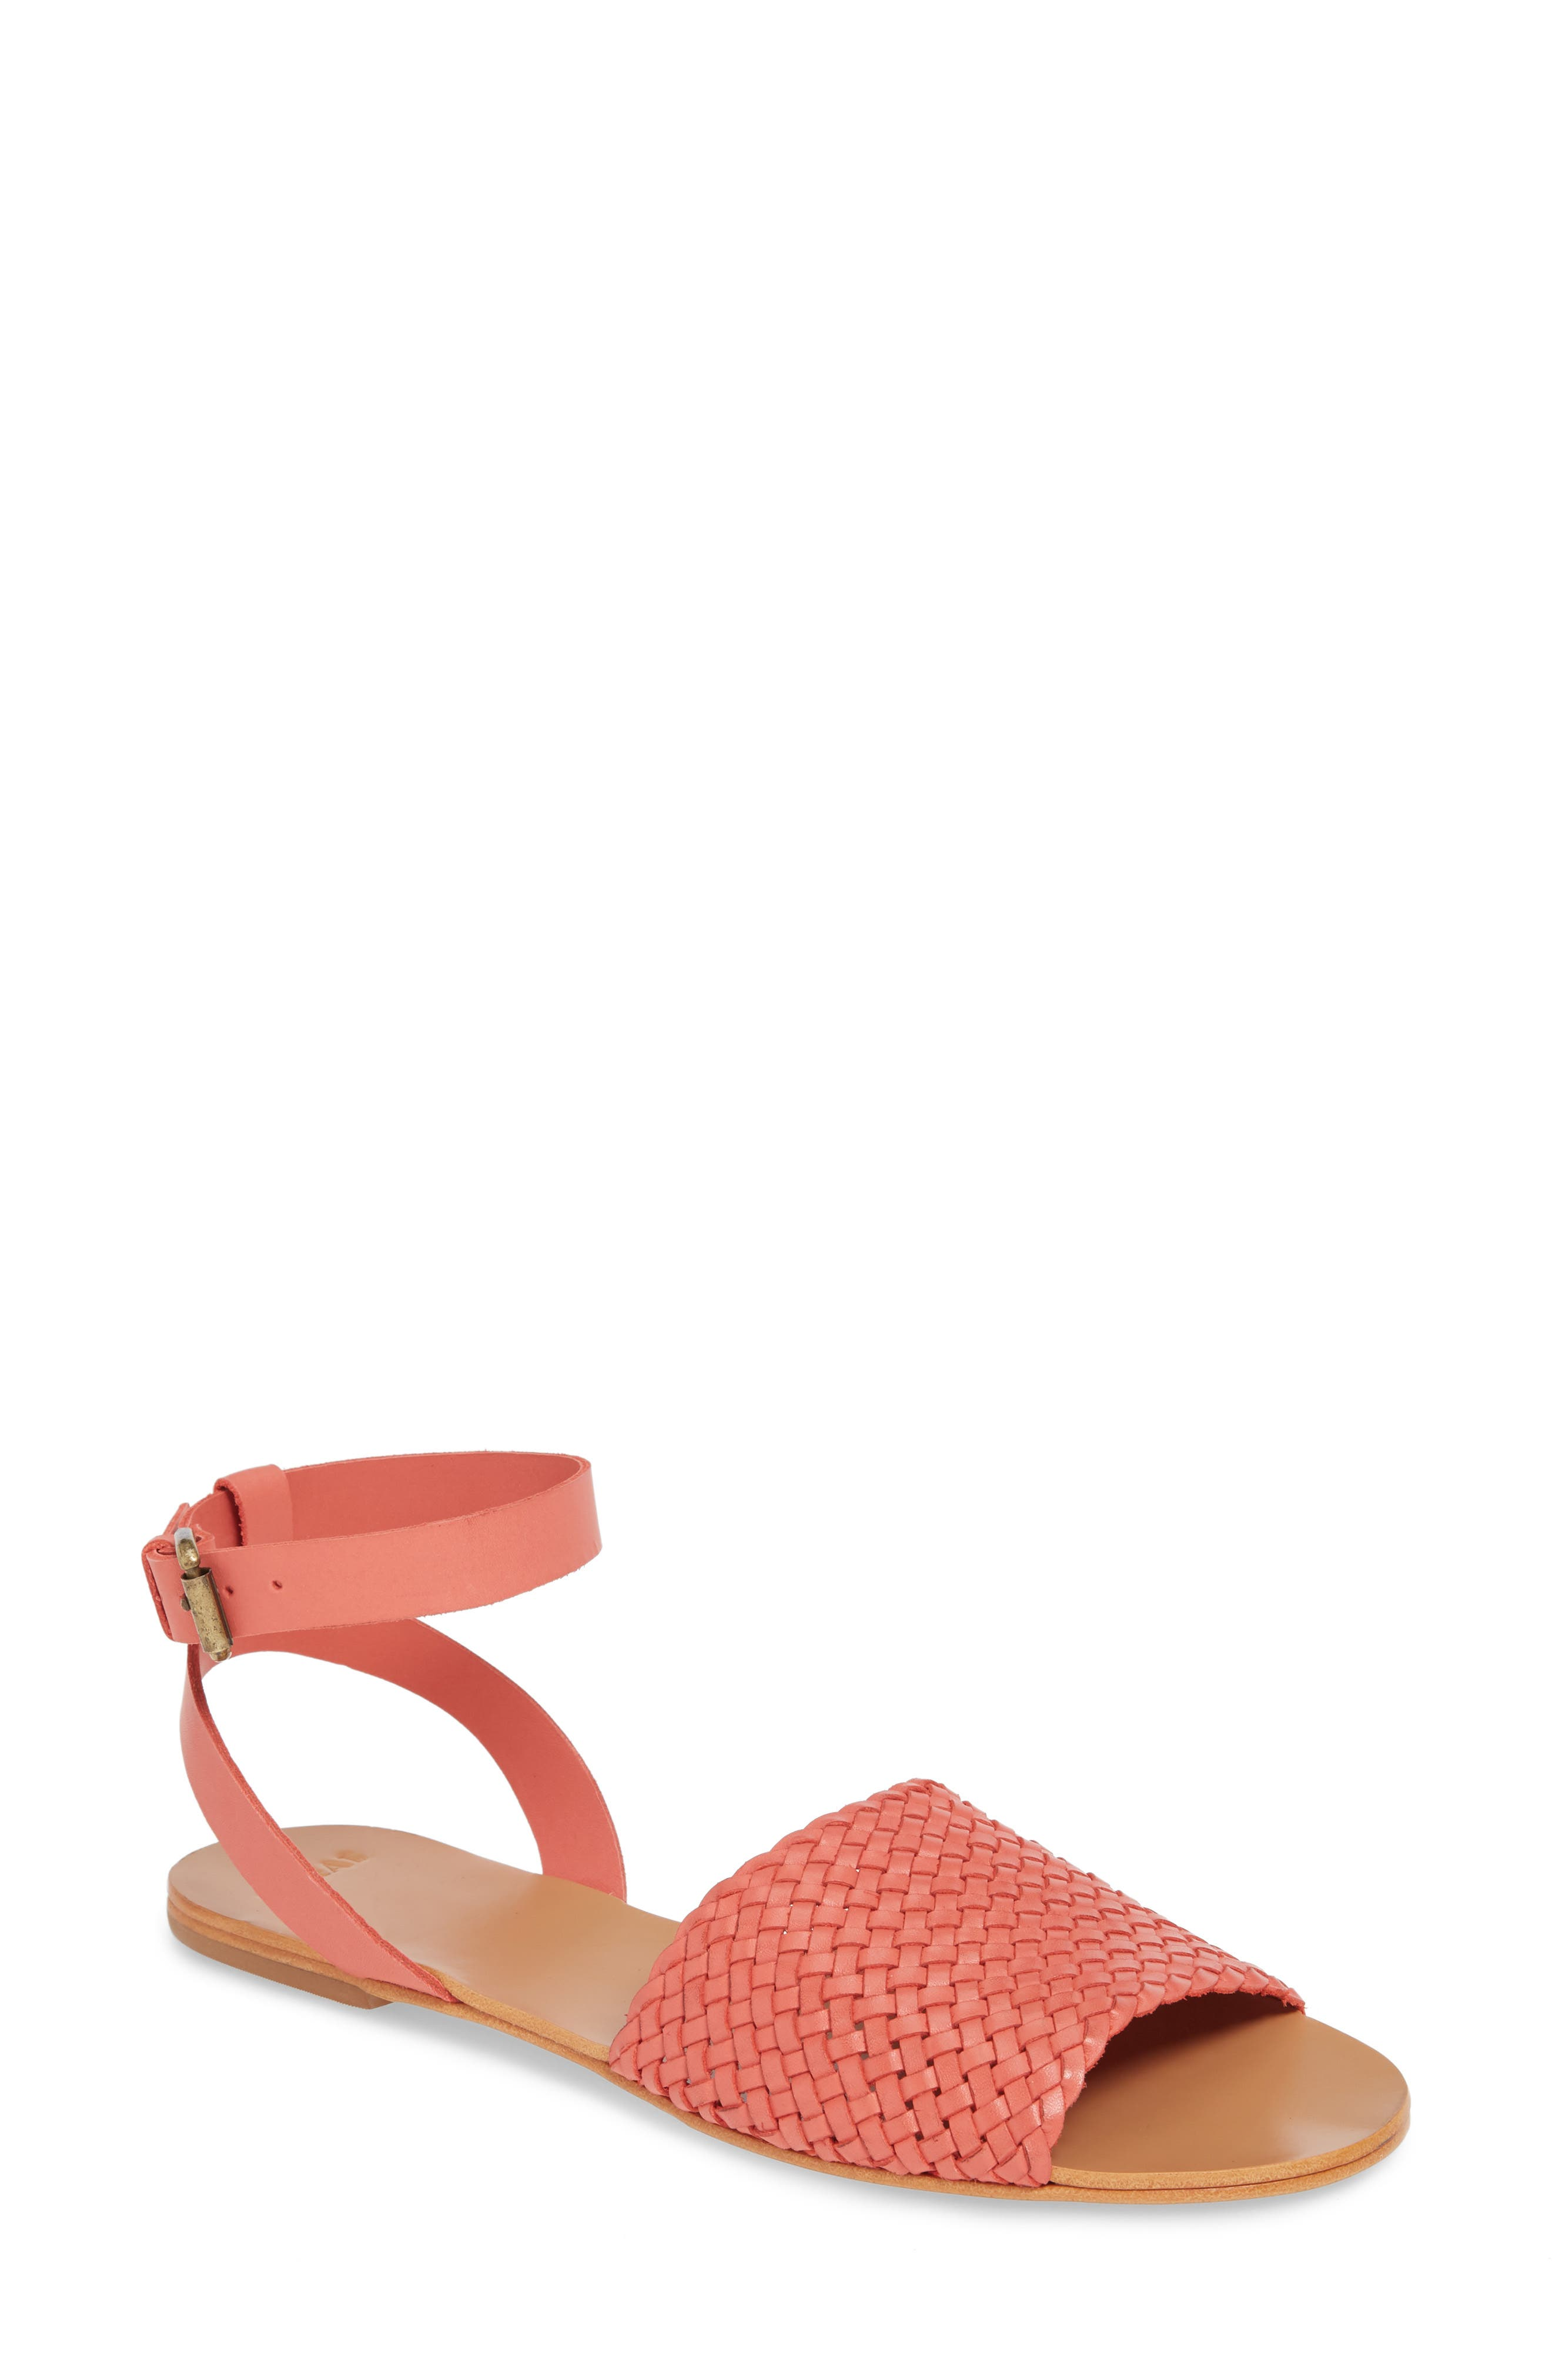 The Great. Caravan Ankle Strap Sandal, Pink